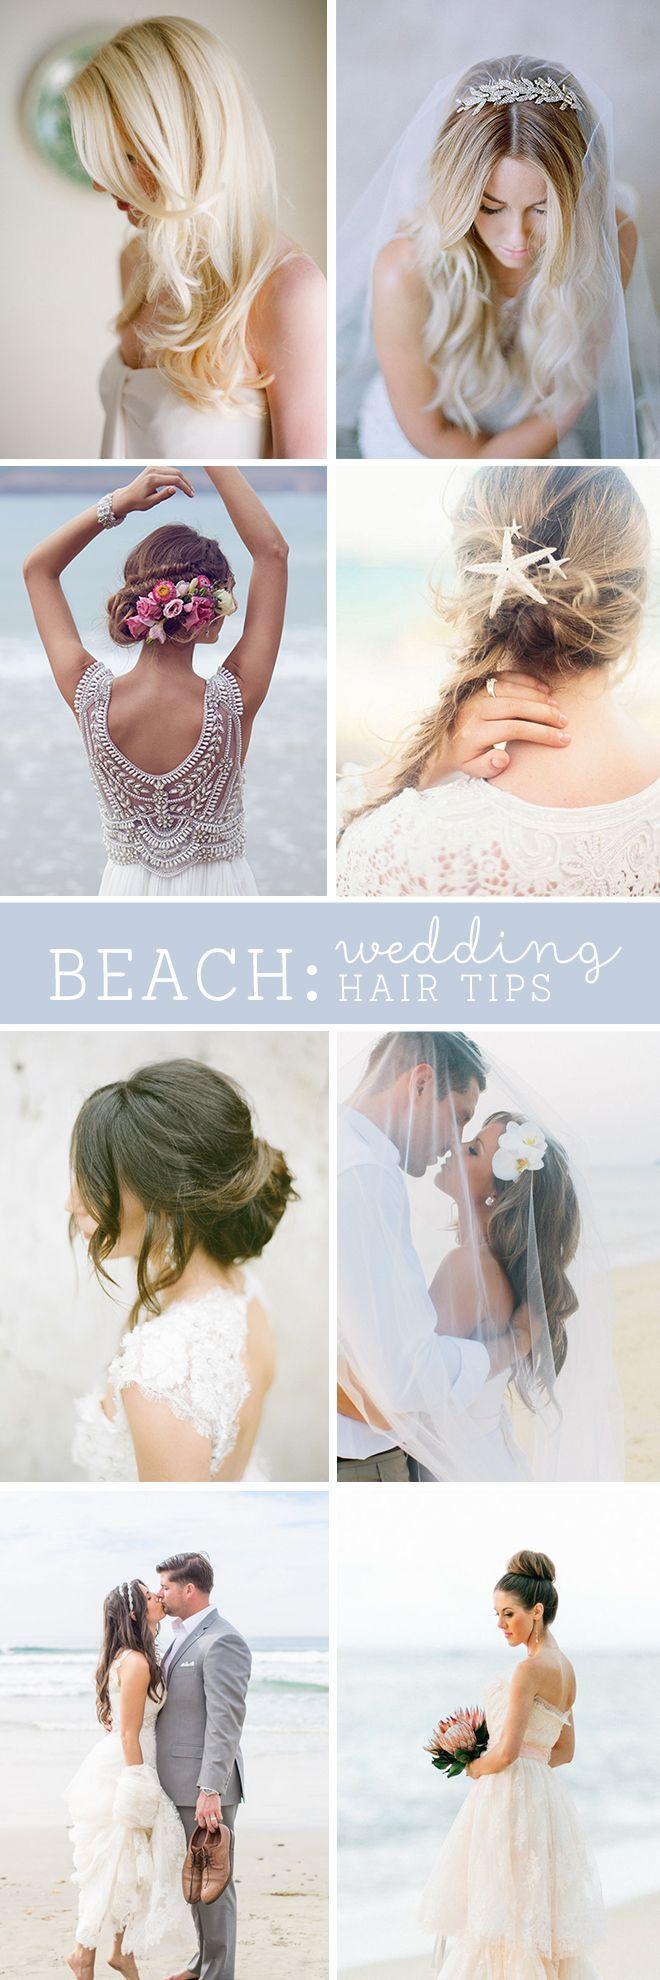 Wedding beach hair   best Wedding ideas images on Pinterest  Bridal hairstyles